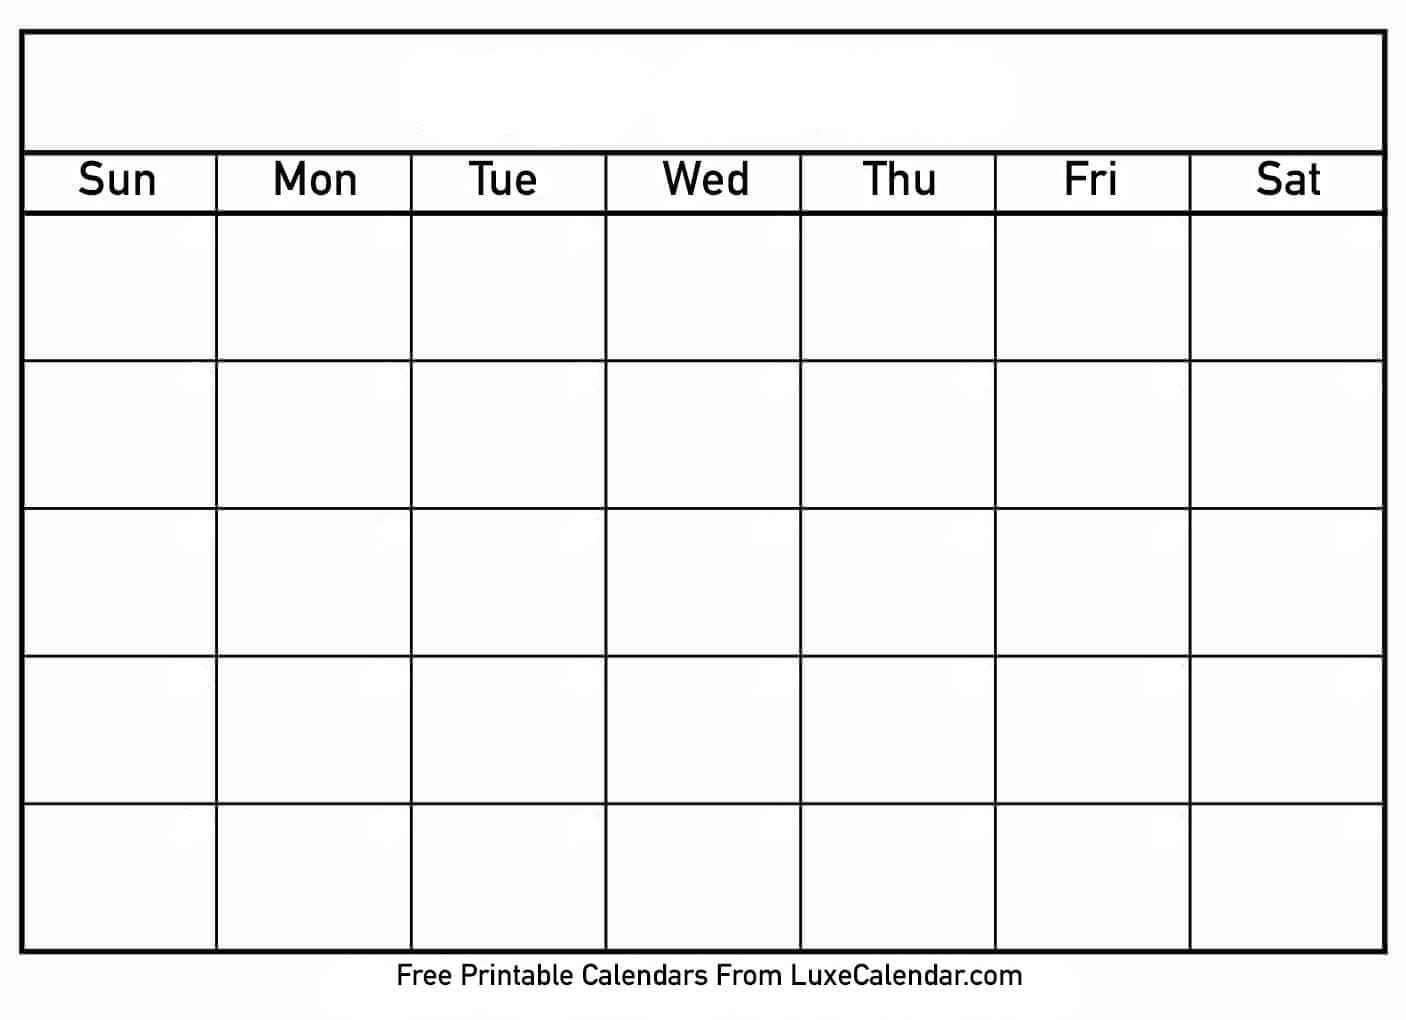 Blank Printable Calendar - Luxe Calendar Inside Blank Calander Template